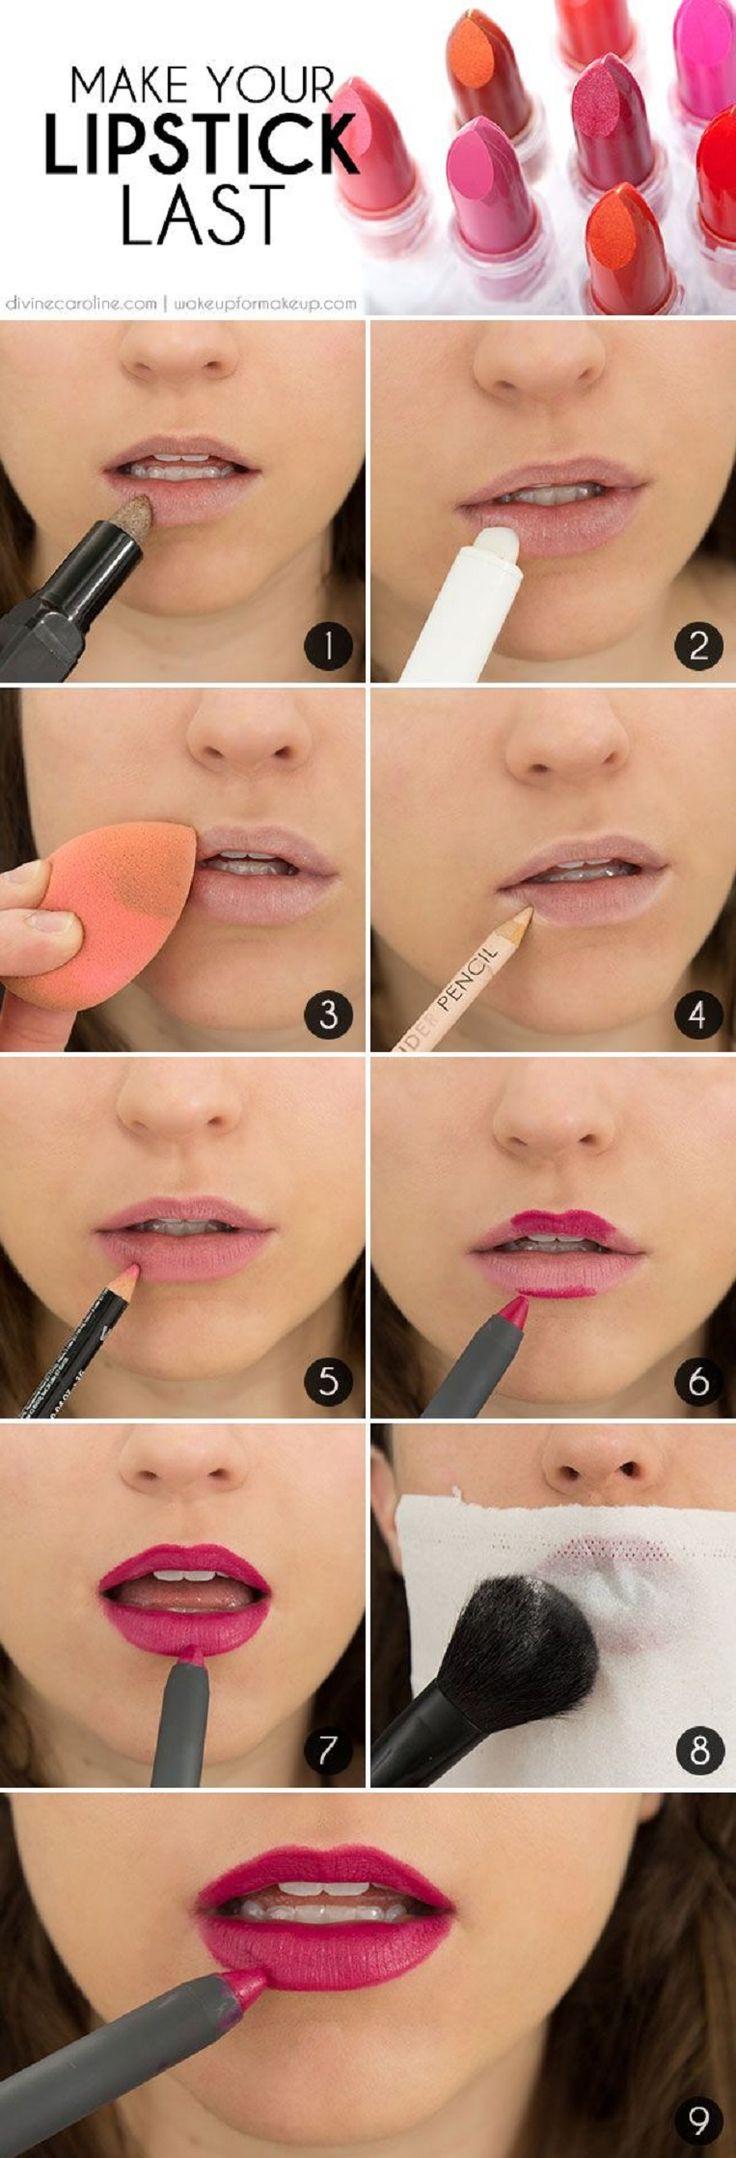 Long-Lasting Purple Lipstick Tutorial - 15 Best Beauty Tutorials for Winter 2014-2015 | GleamItUp